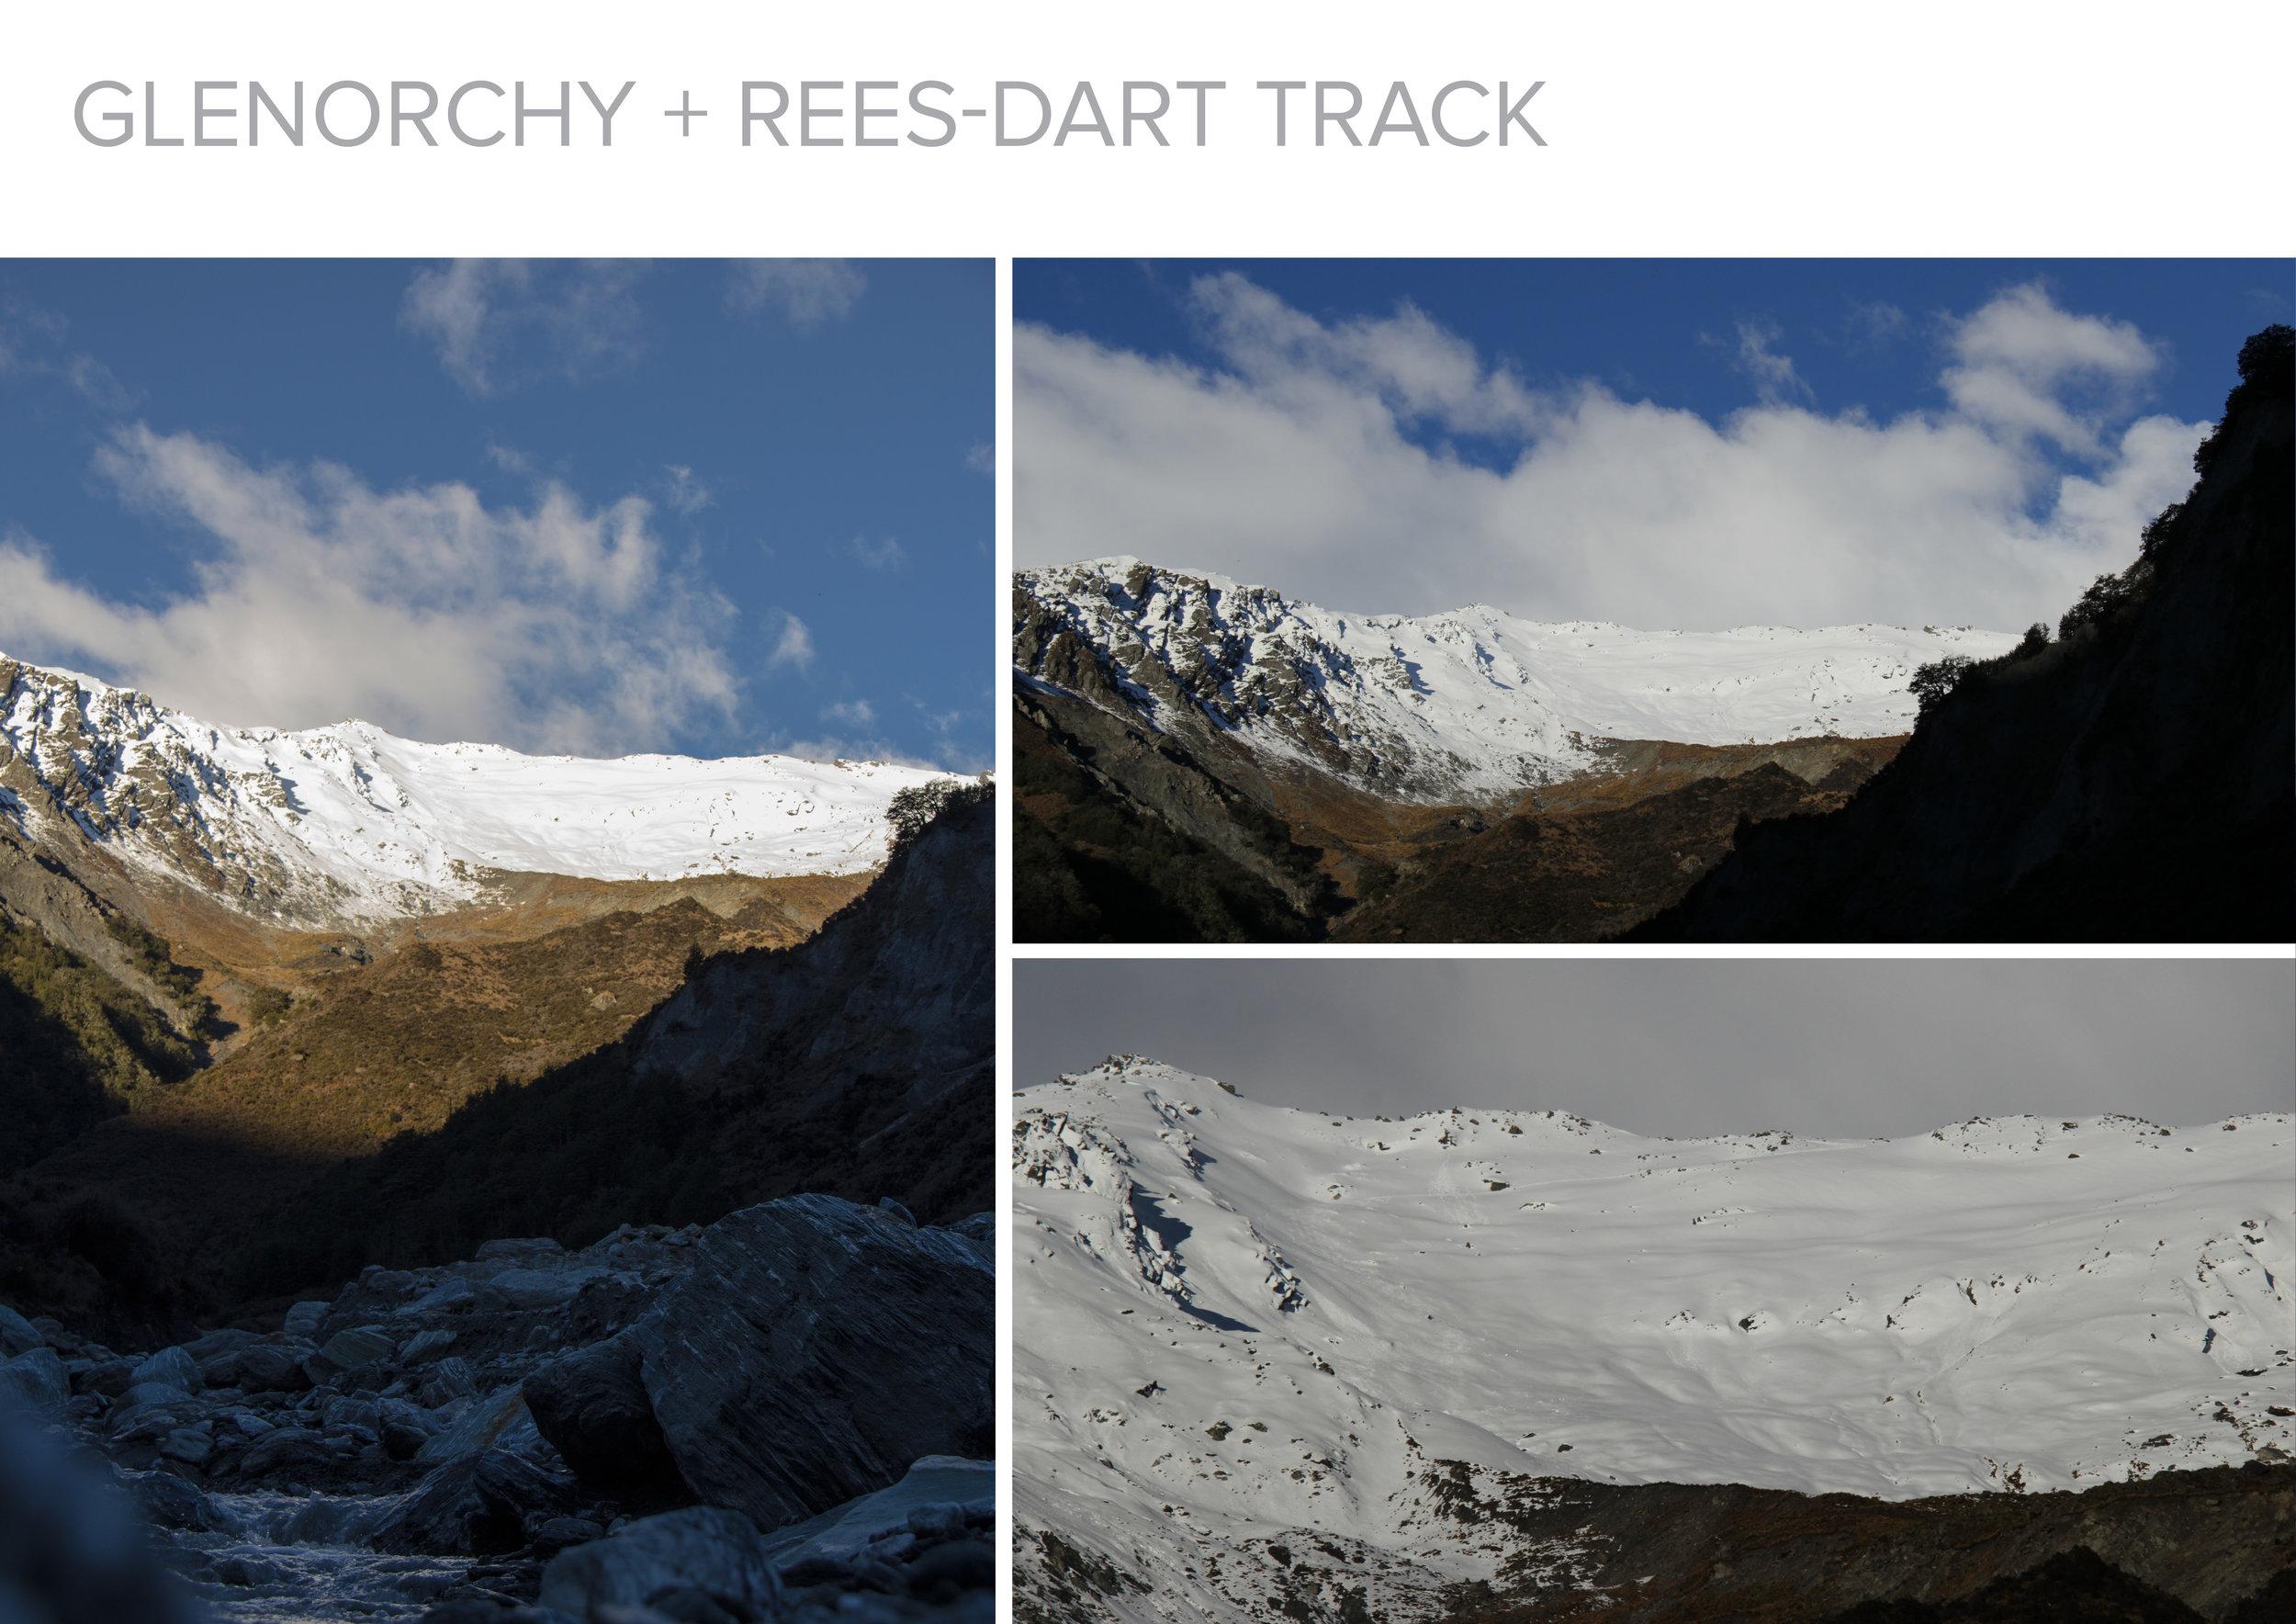 Backcountry-NZ-LocationRecci6.jpg